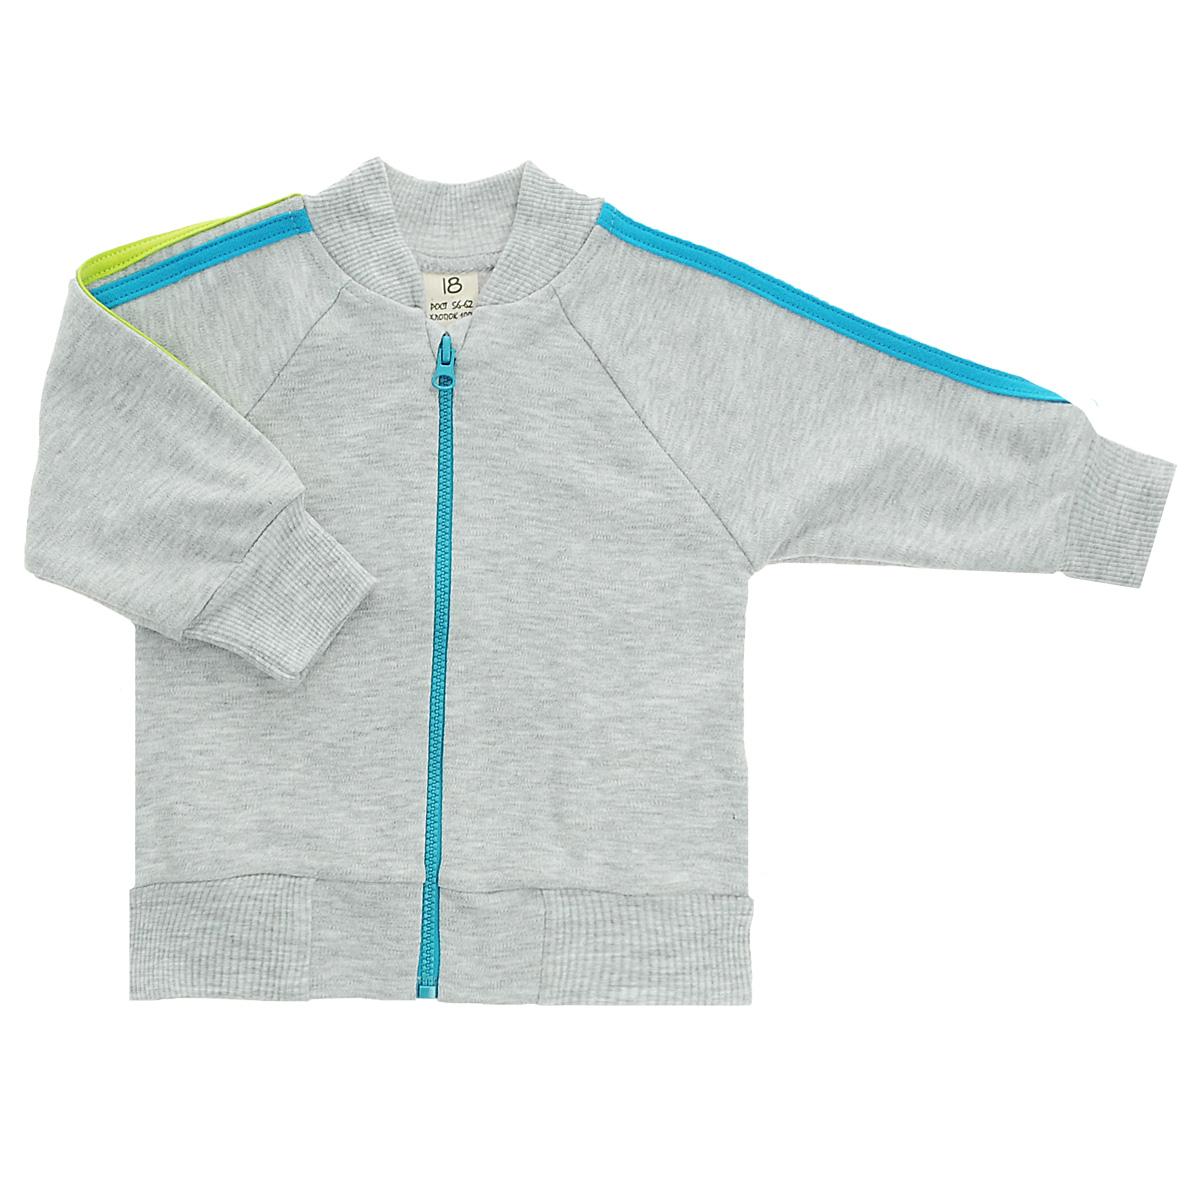 Толстовка детская Lucky Child, цвет: серый, голубой. 1-18. Размер 86/92